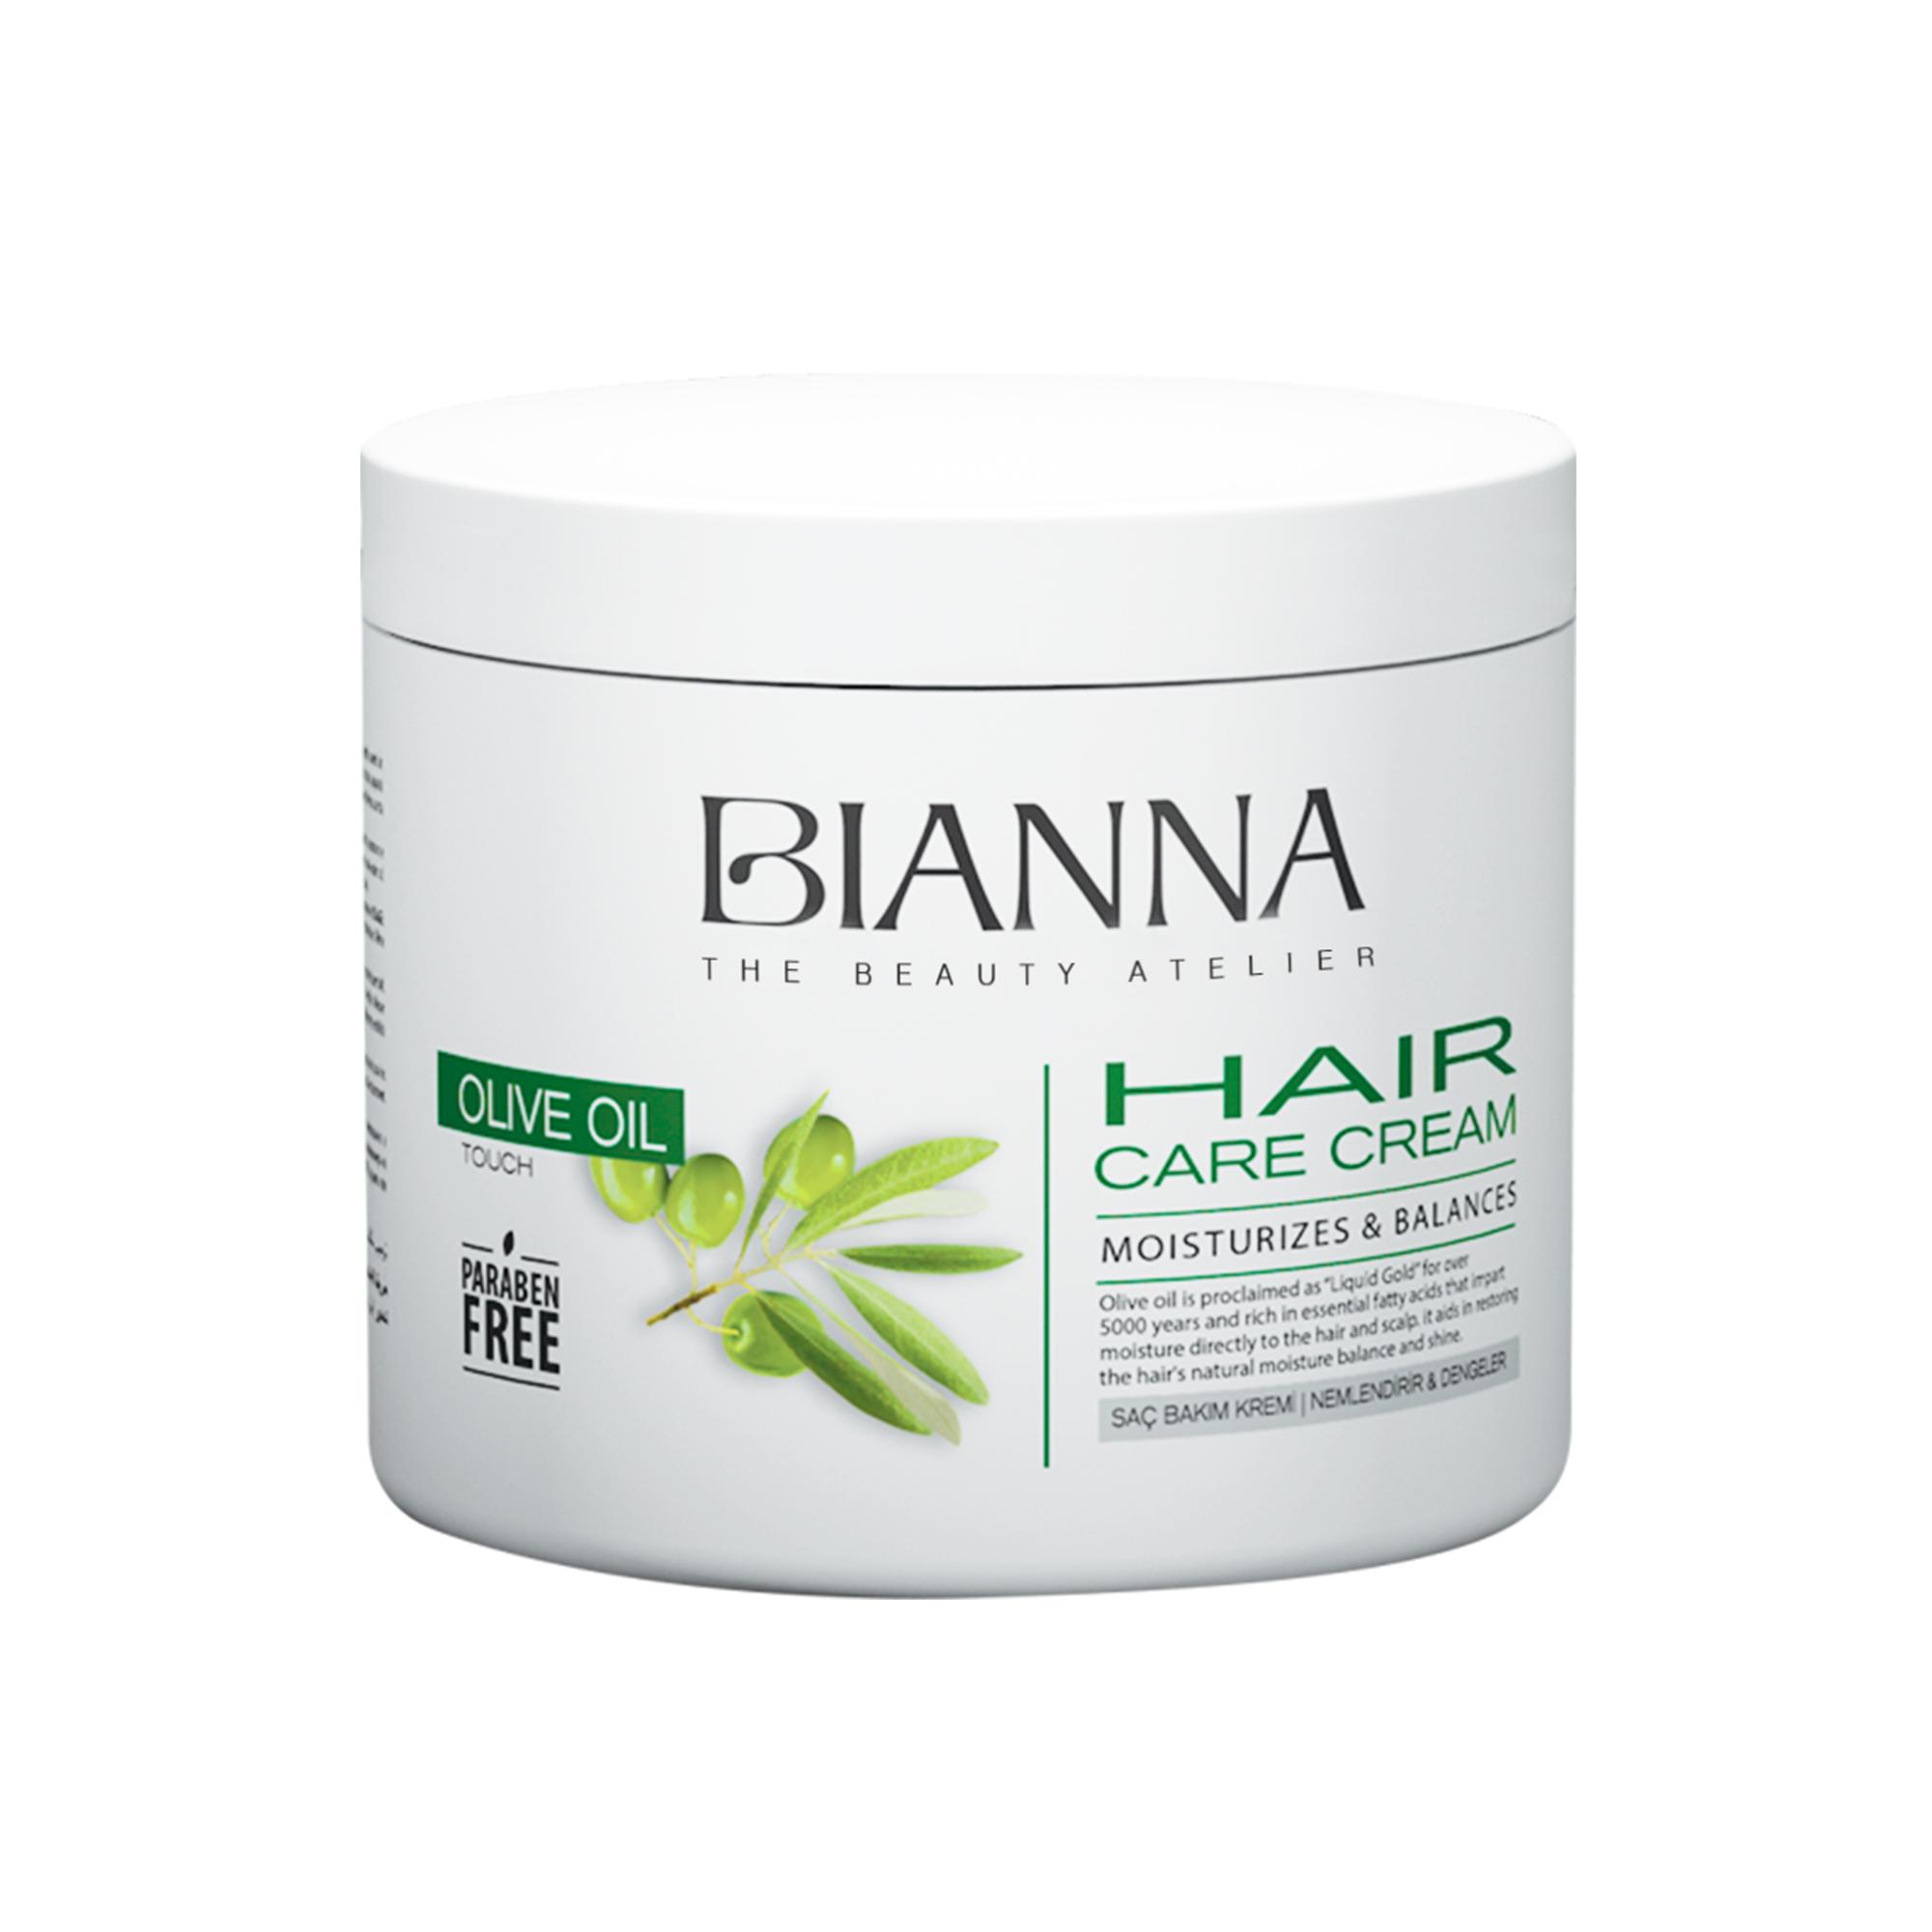 BIANNA HAIR CARE CREAM - OLIVE OIL / 2203-03